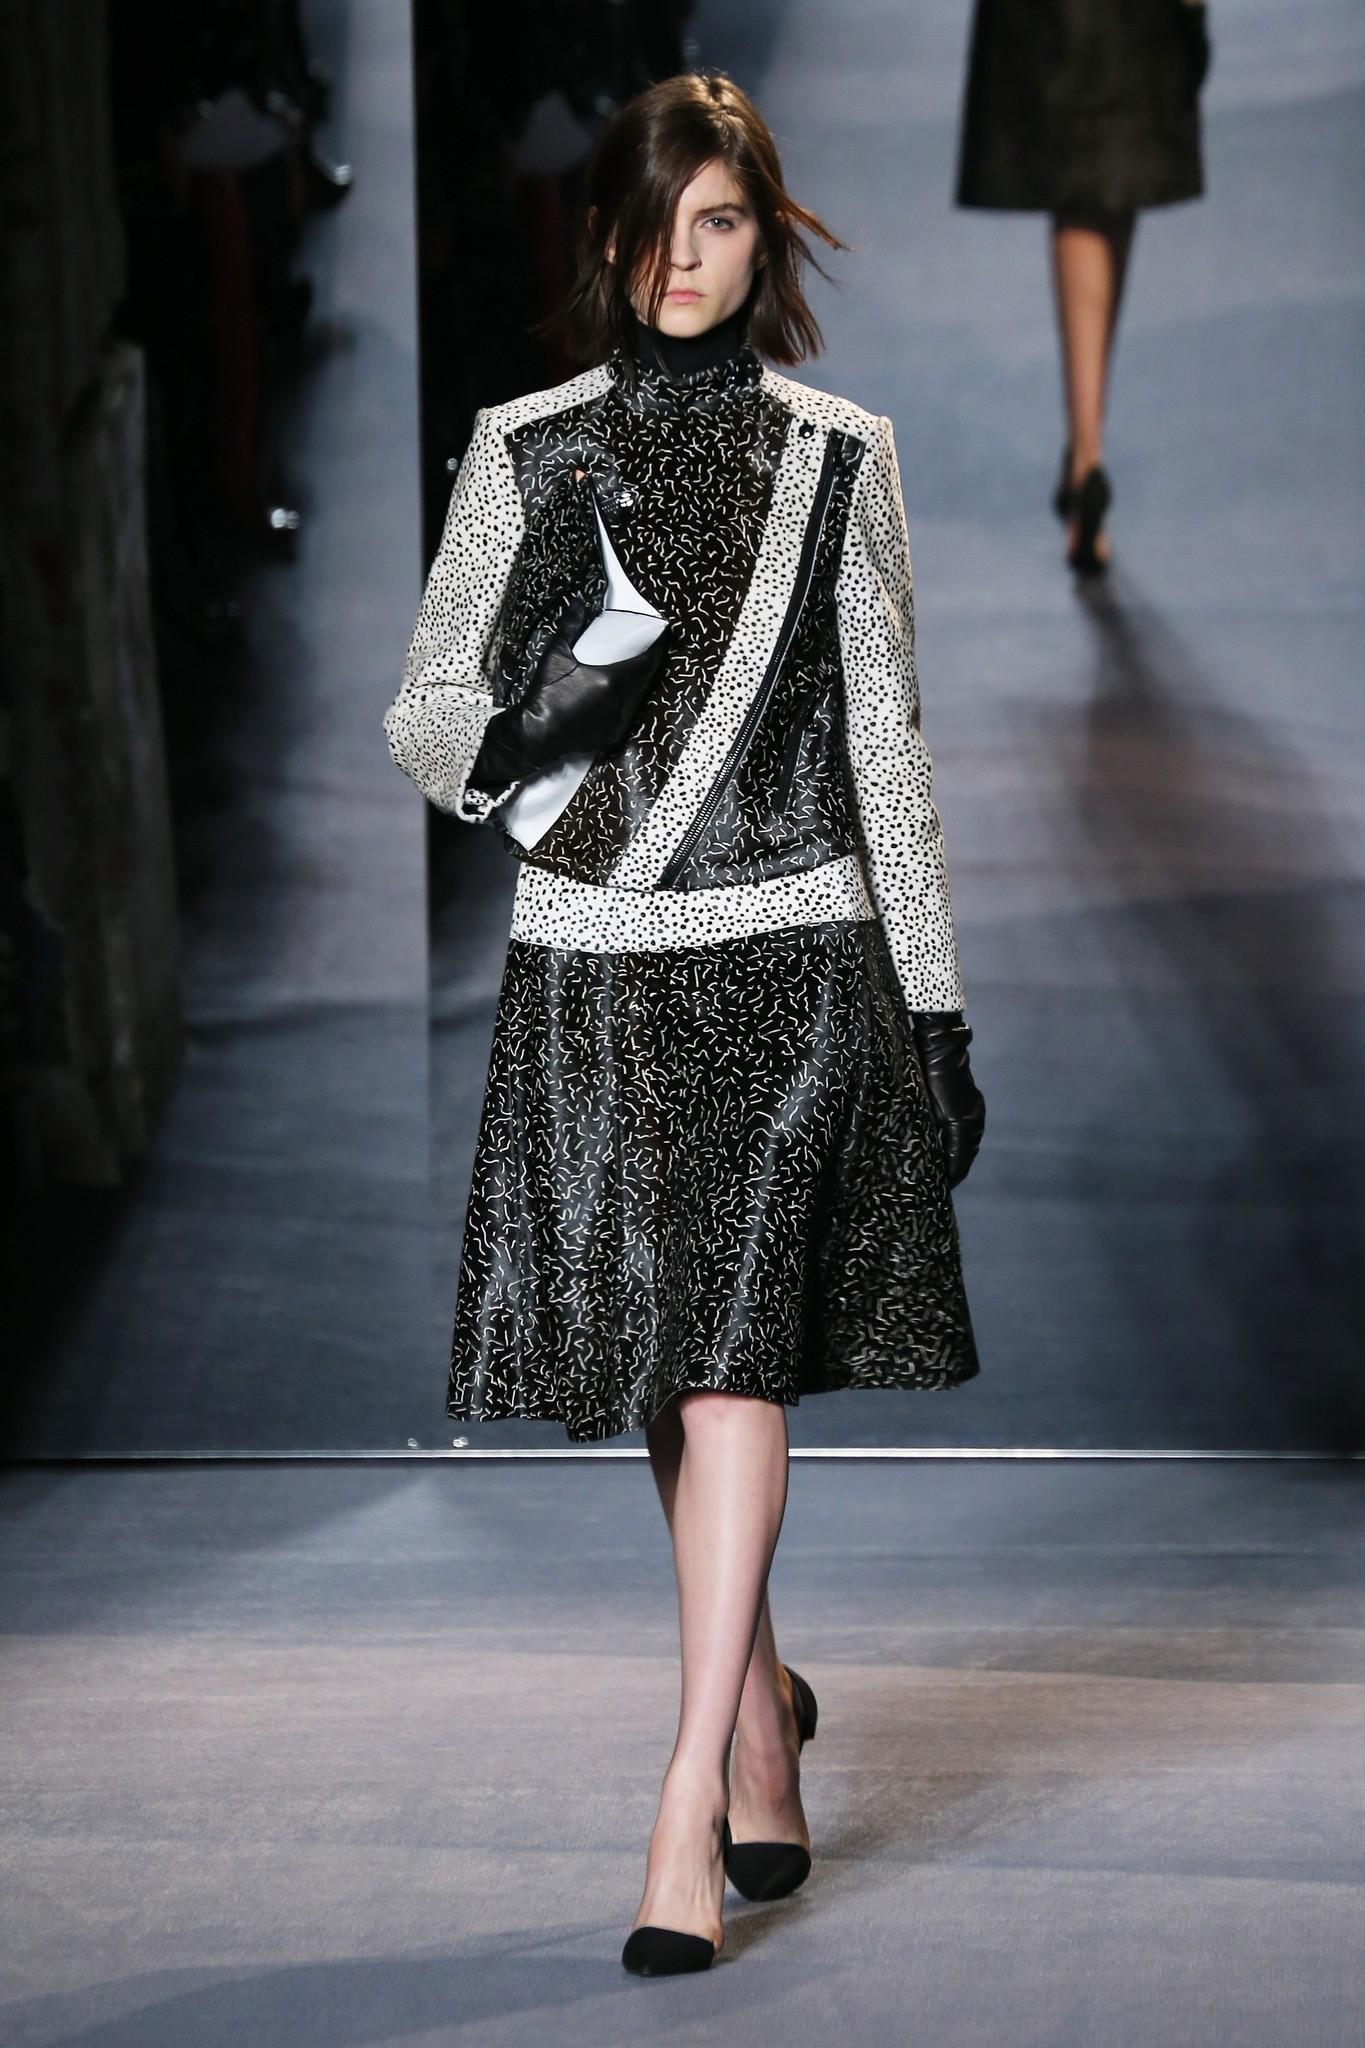 New York Fashion Week Fall 2013 Proenza Schouler La Times